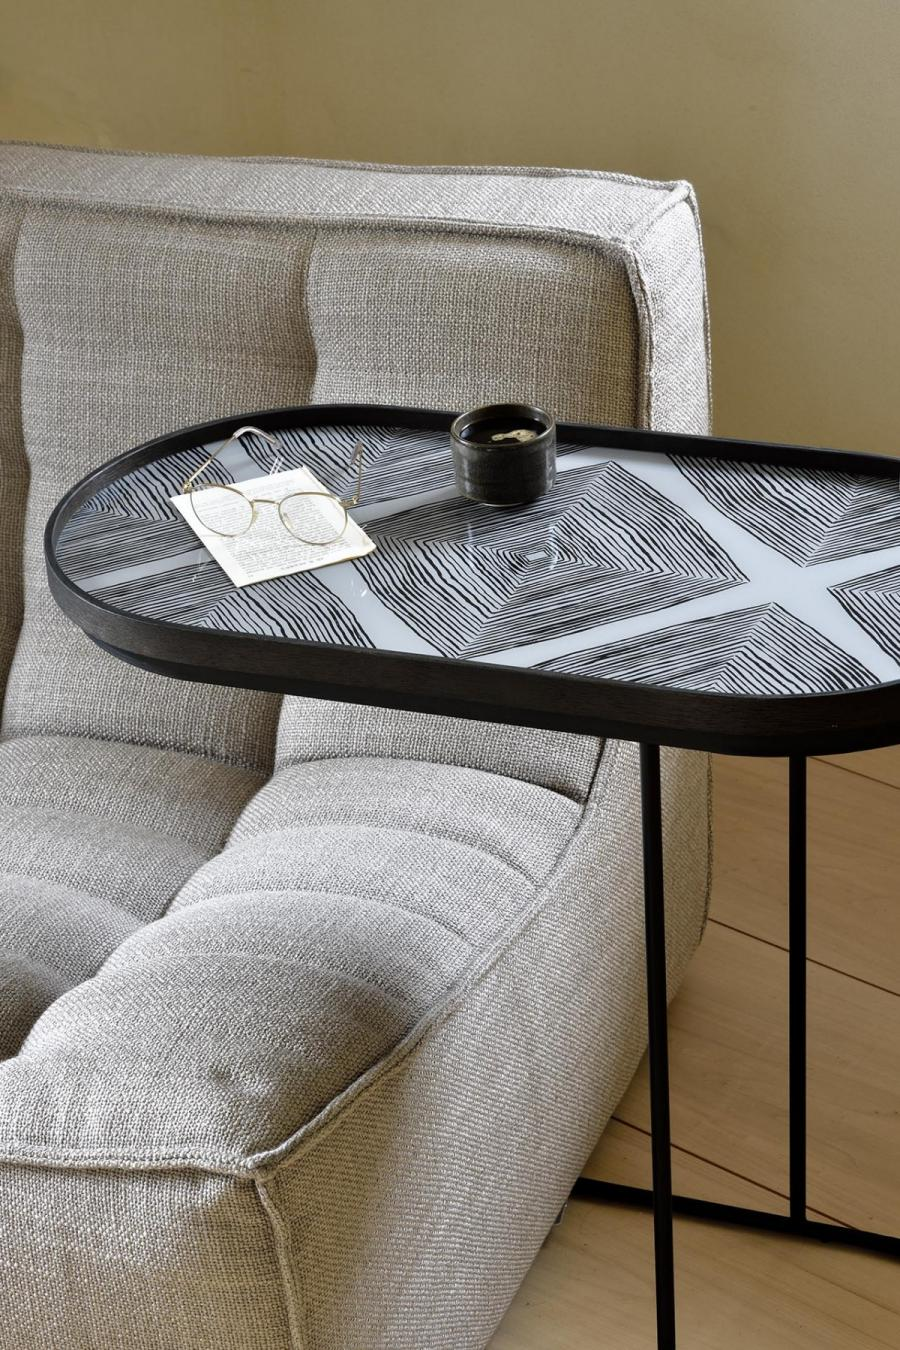 Ethnicraft - Ovalen dienbladen - Slate Linear Squares glazen dienblad - M